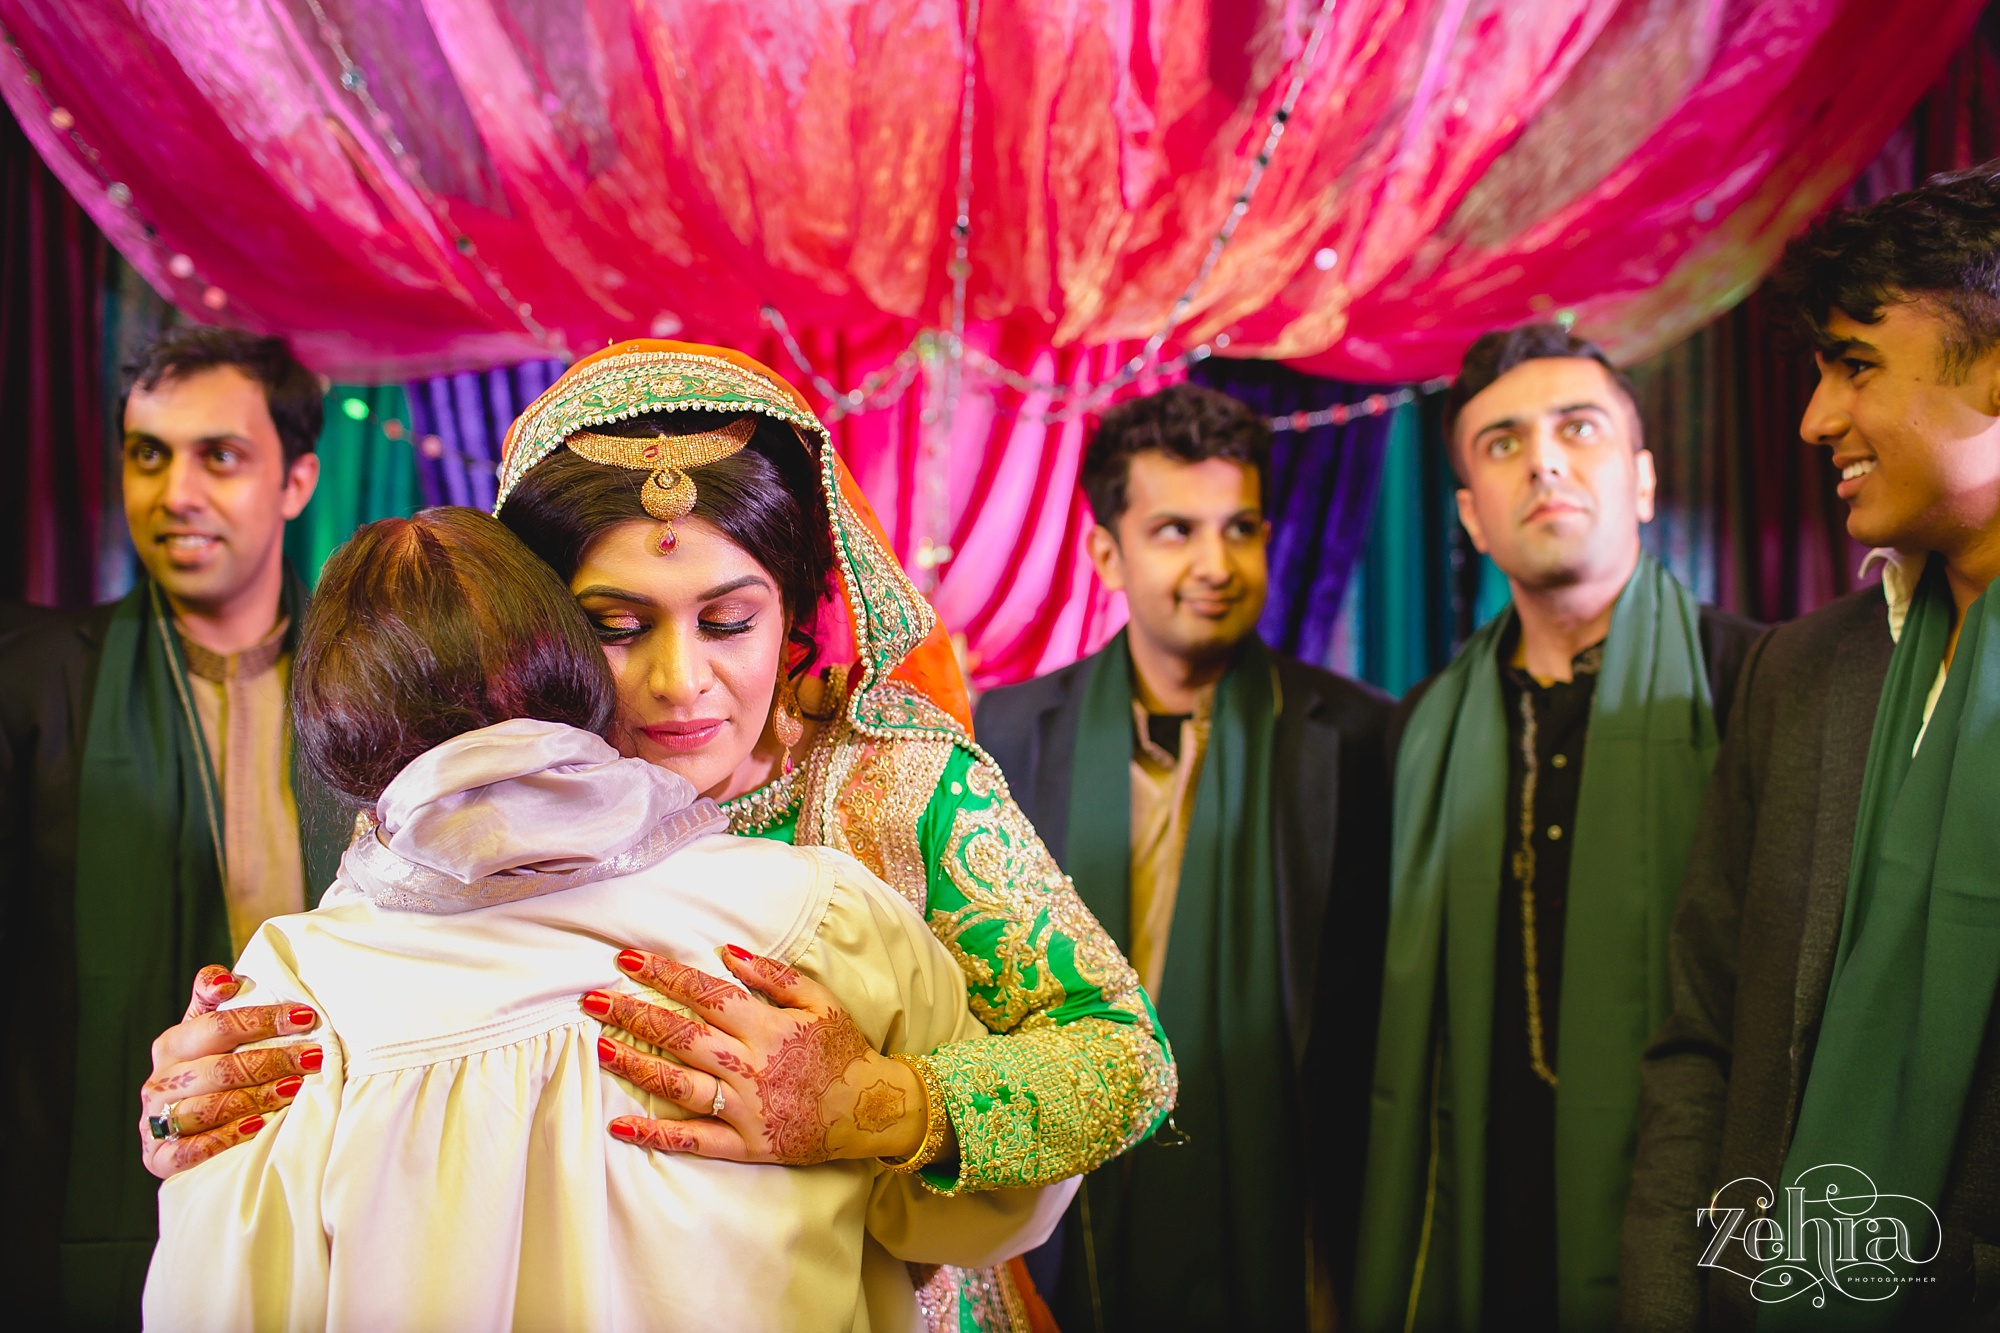 zehra wedding photographer arley hall cheshire030.jpg